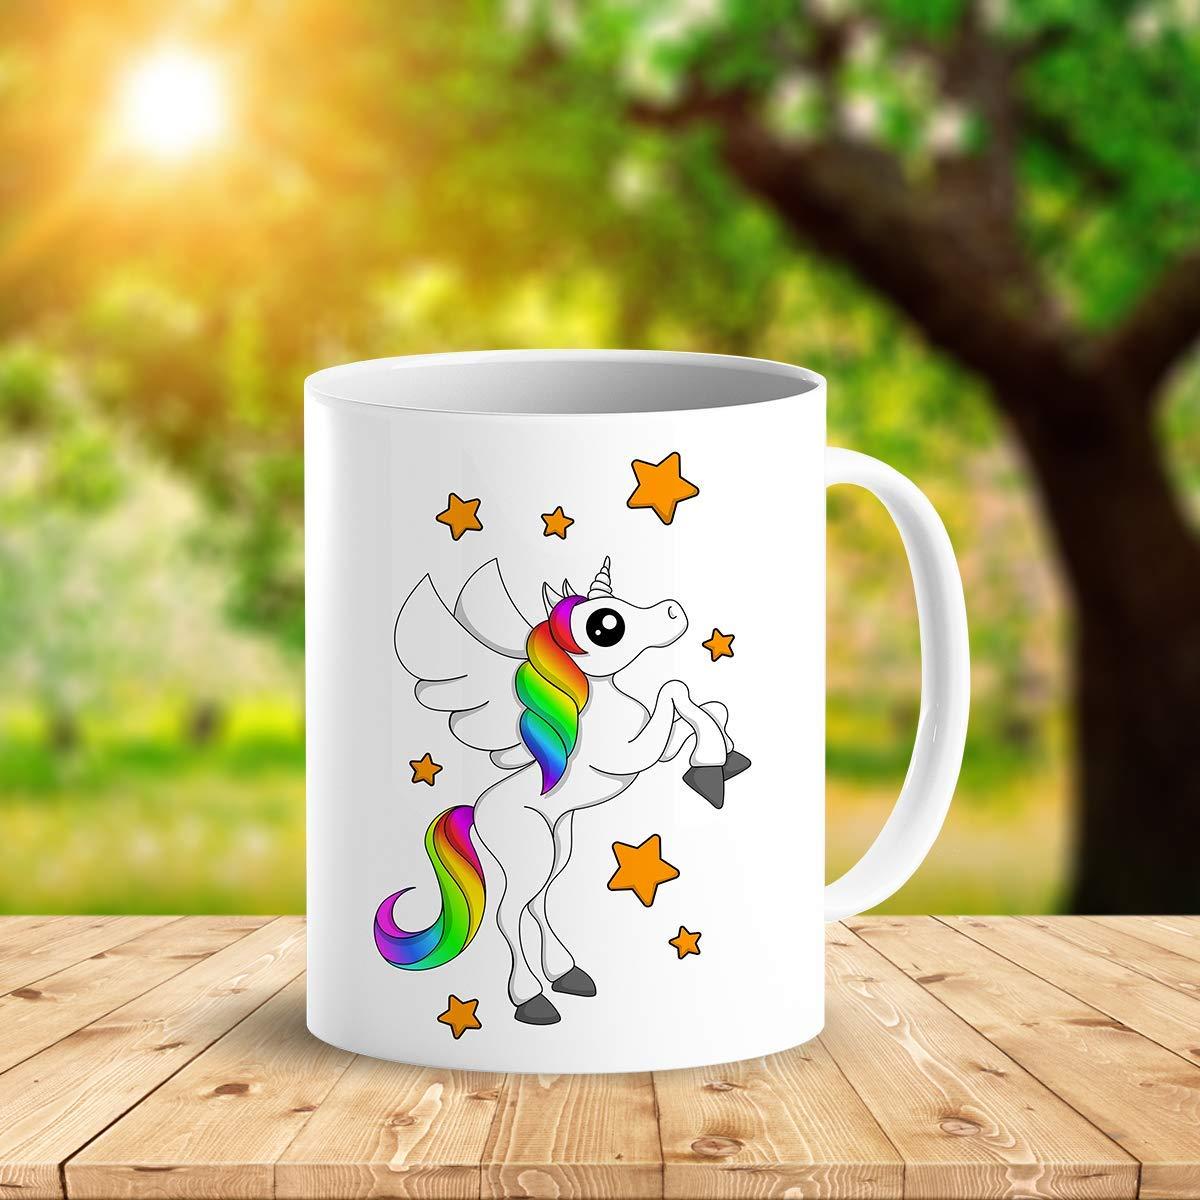 Heat Sensitive Color Changing Coffee Mug Funny Coffee Cup White Unicorn Design Funny Gift Idea B07D21VPWS 2